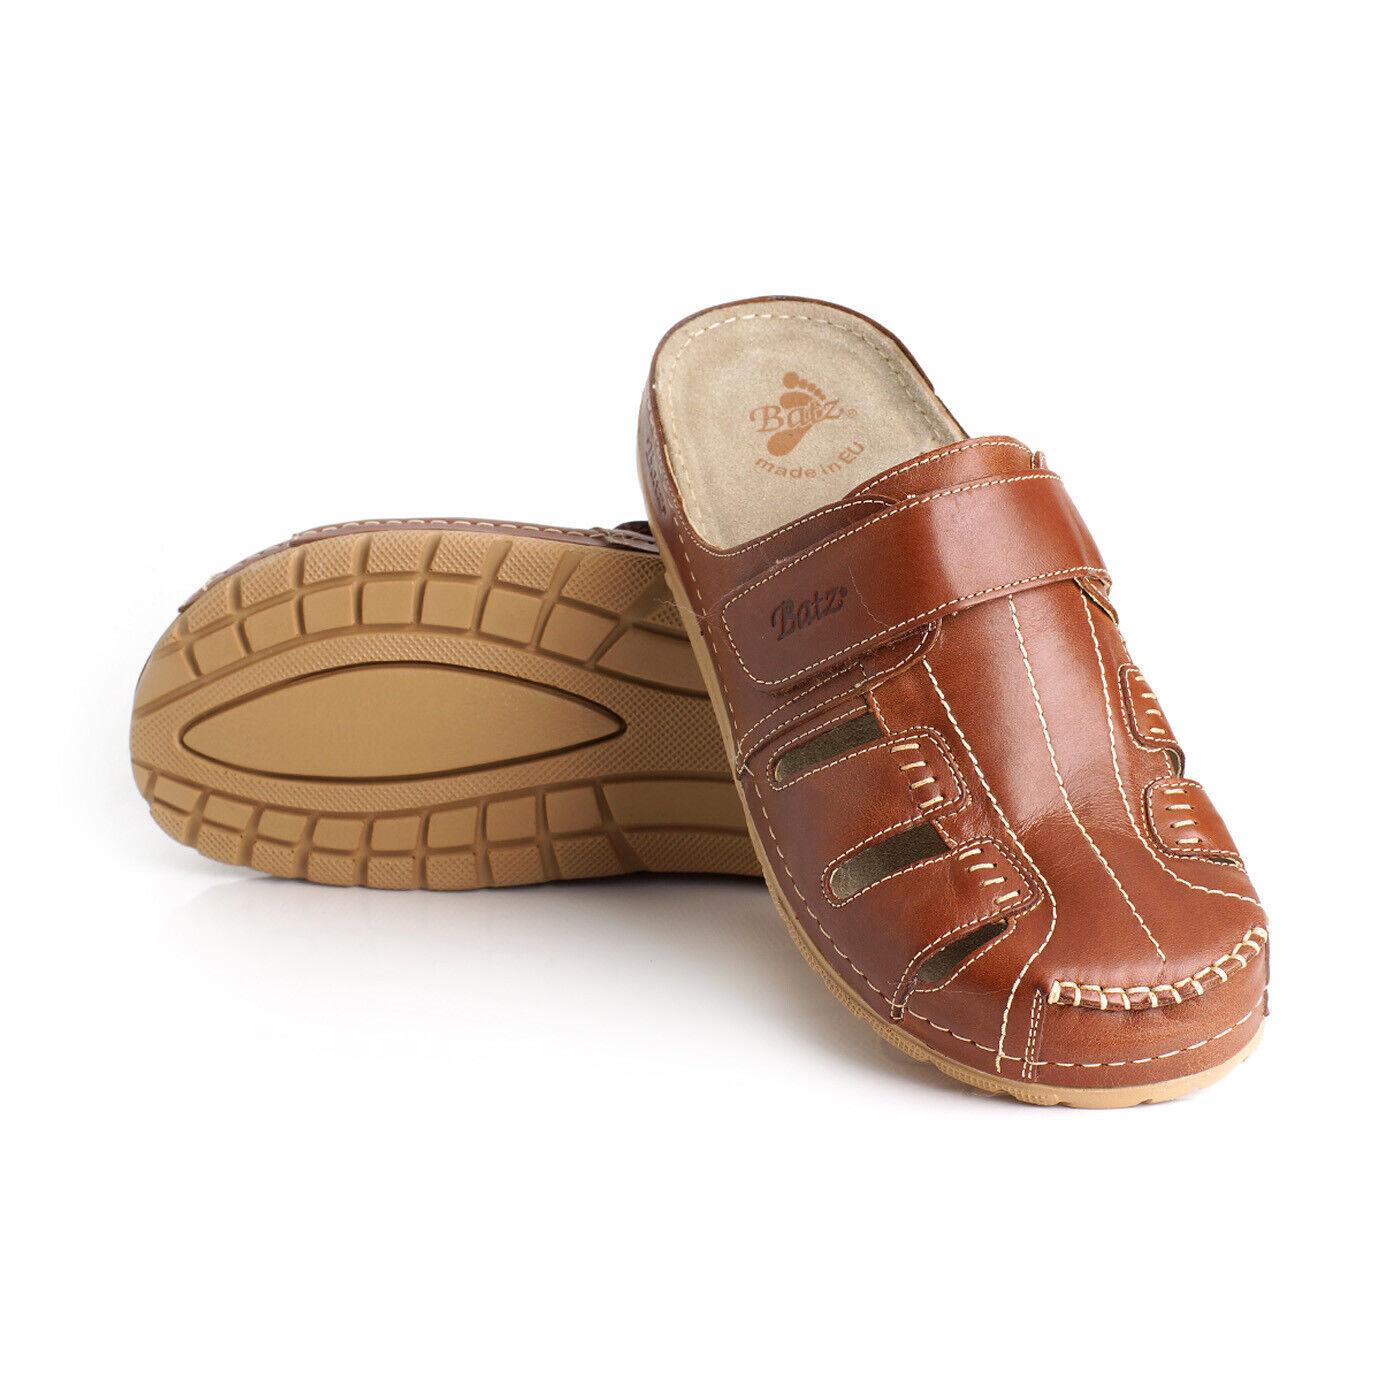 Batz KZ braun Men Leather Slip On Sandals, EU 45, UK 10.5